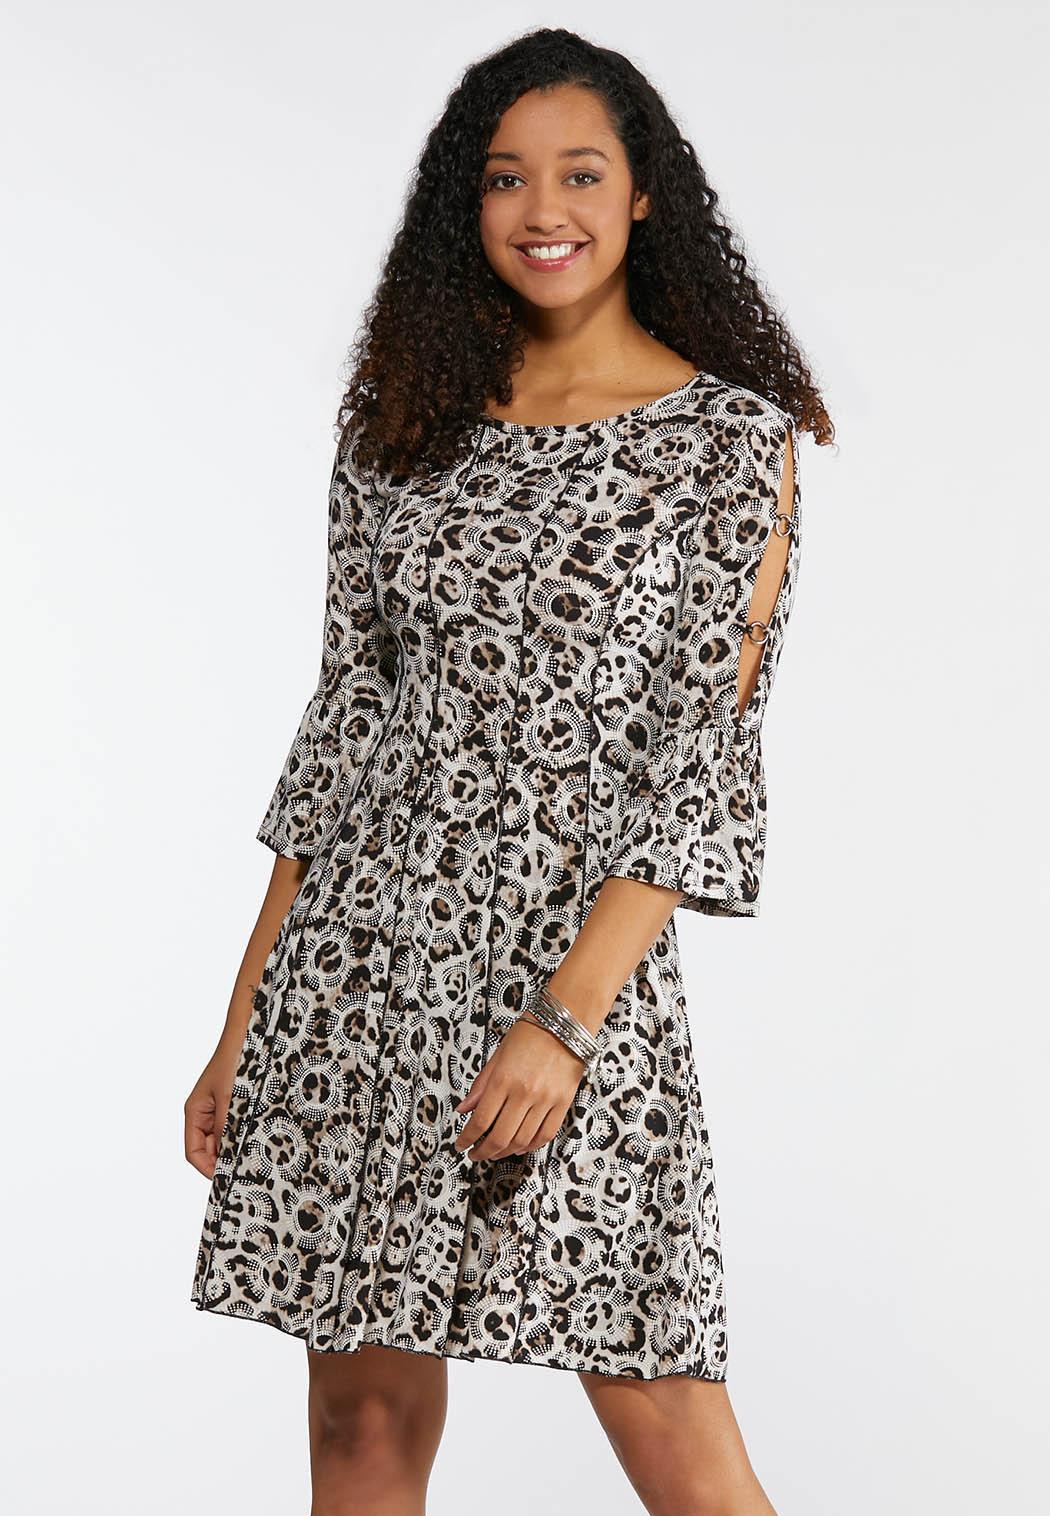 ebebb0d1 Embellished Animal Print Dress A- Line & Amp ; Swing Cato Fashions